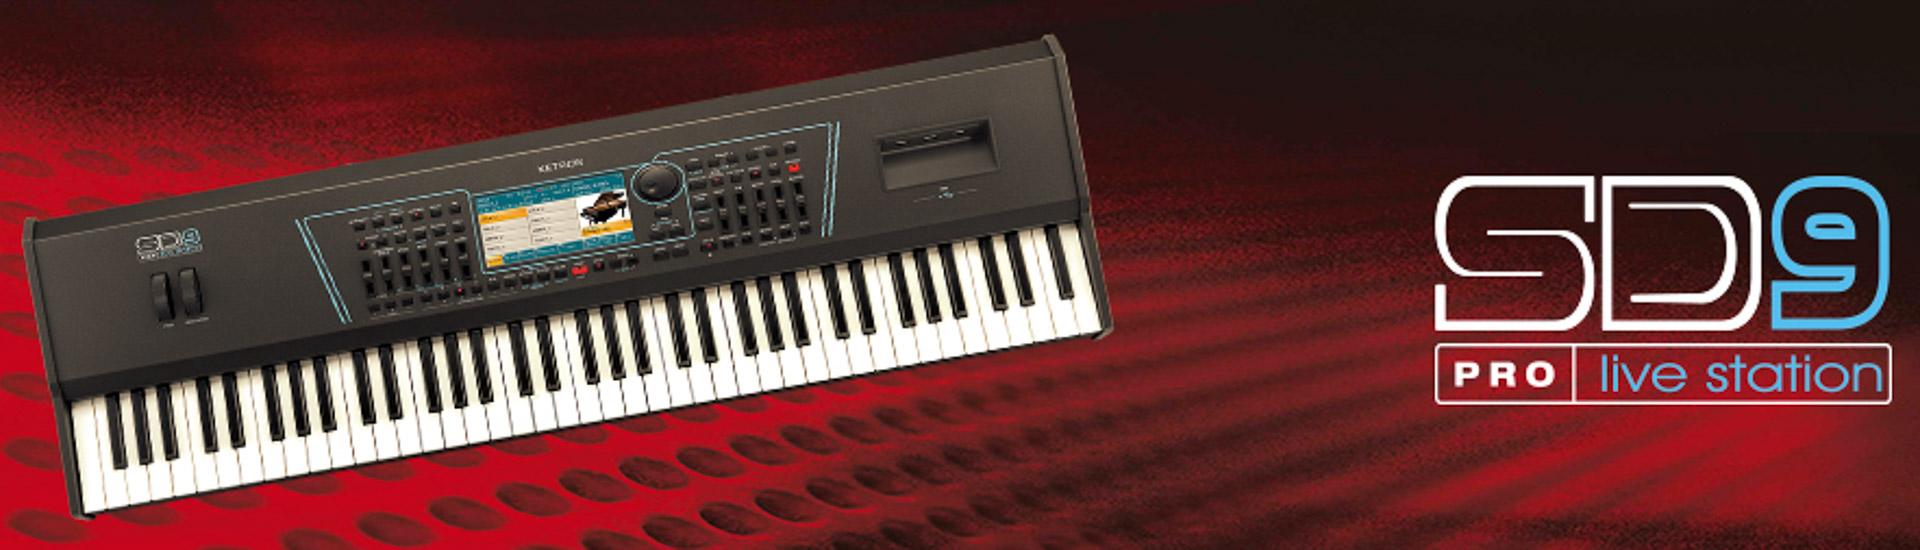 Ketron teclados profissionais SD9